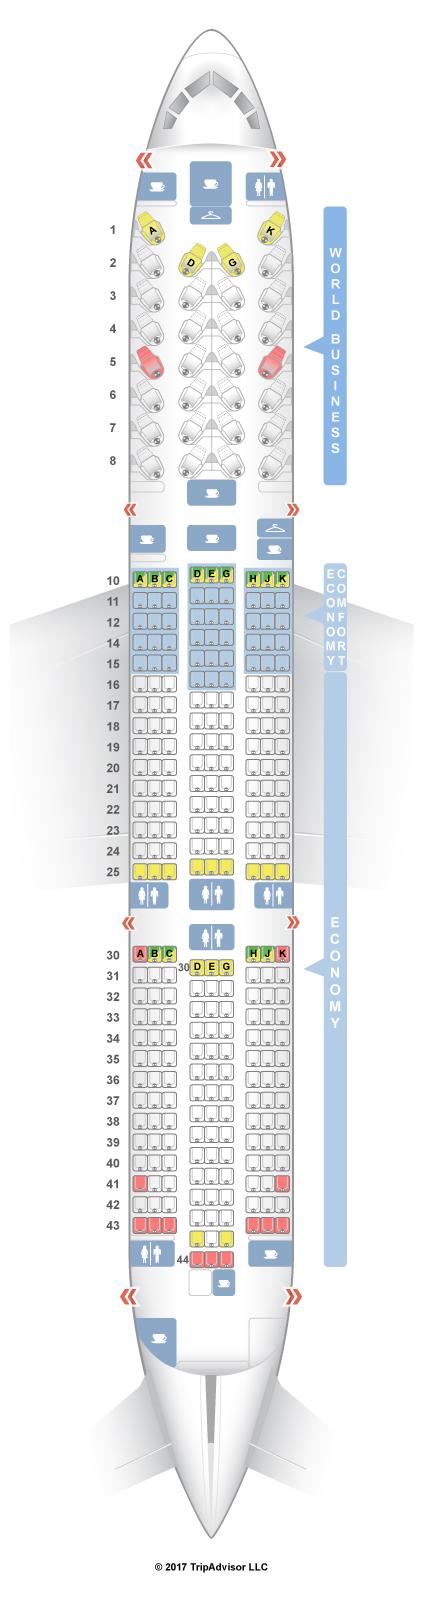 Seatguru Seat Map Klm Boeing 787 9 789